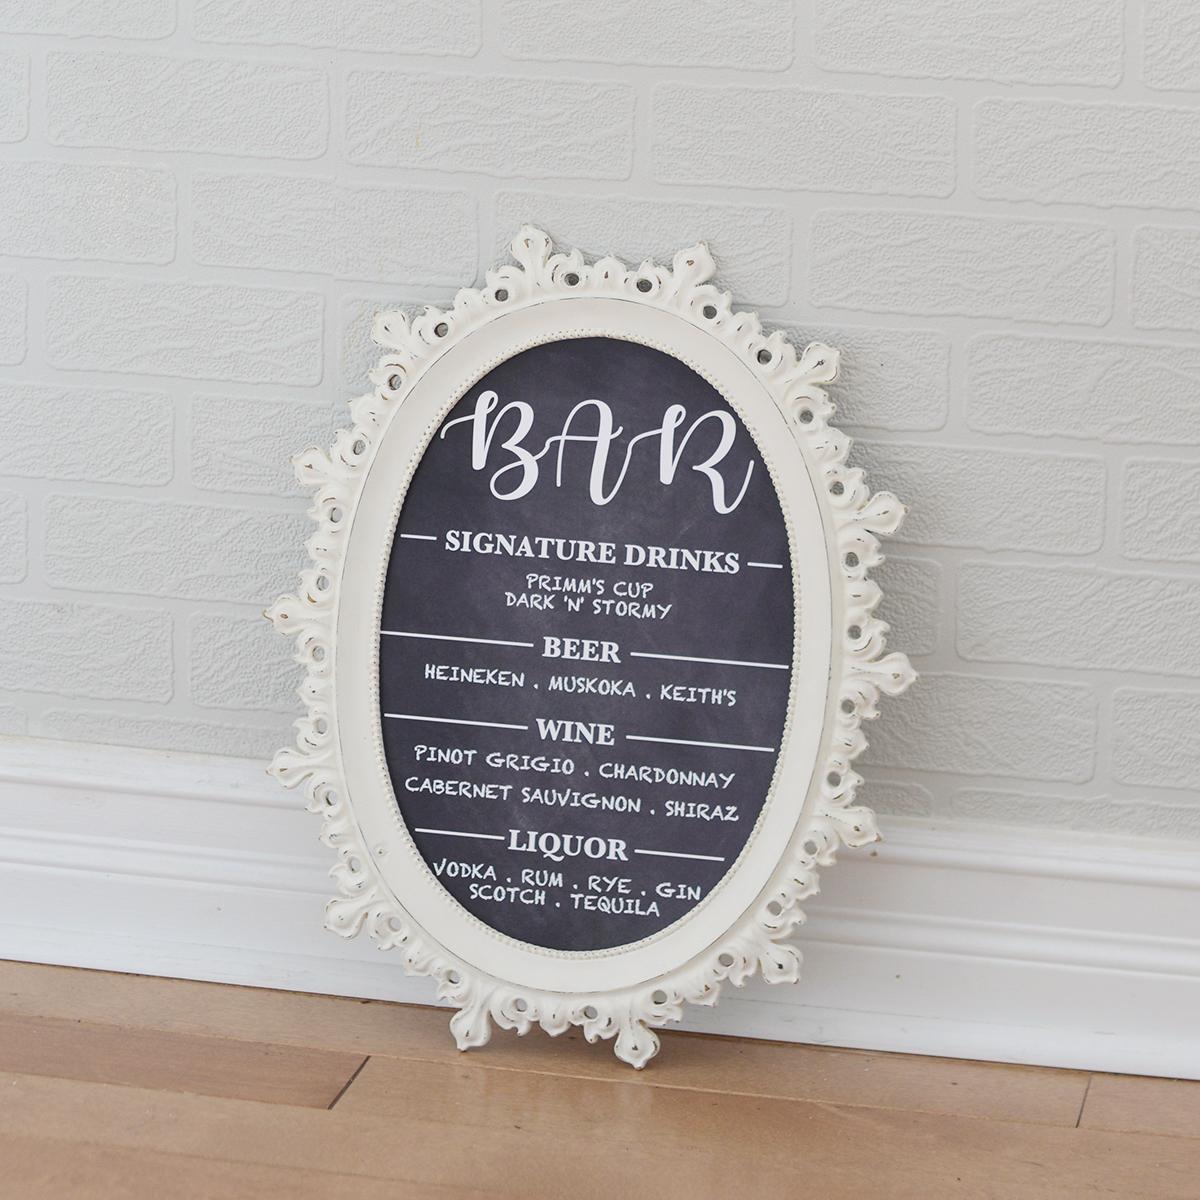 "9.25"" x 13.25"" dollie frame - shown w/ custom sign"